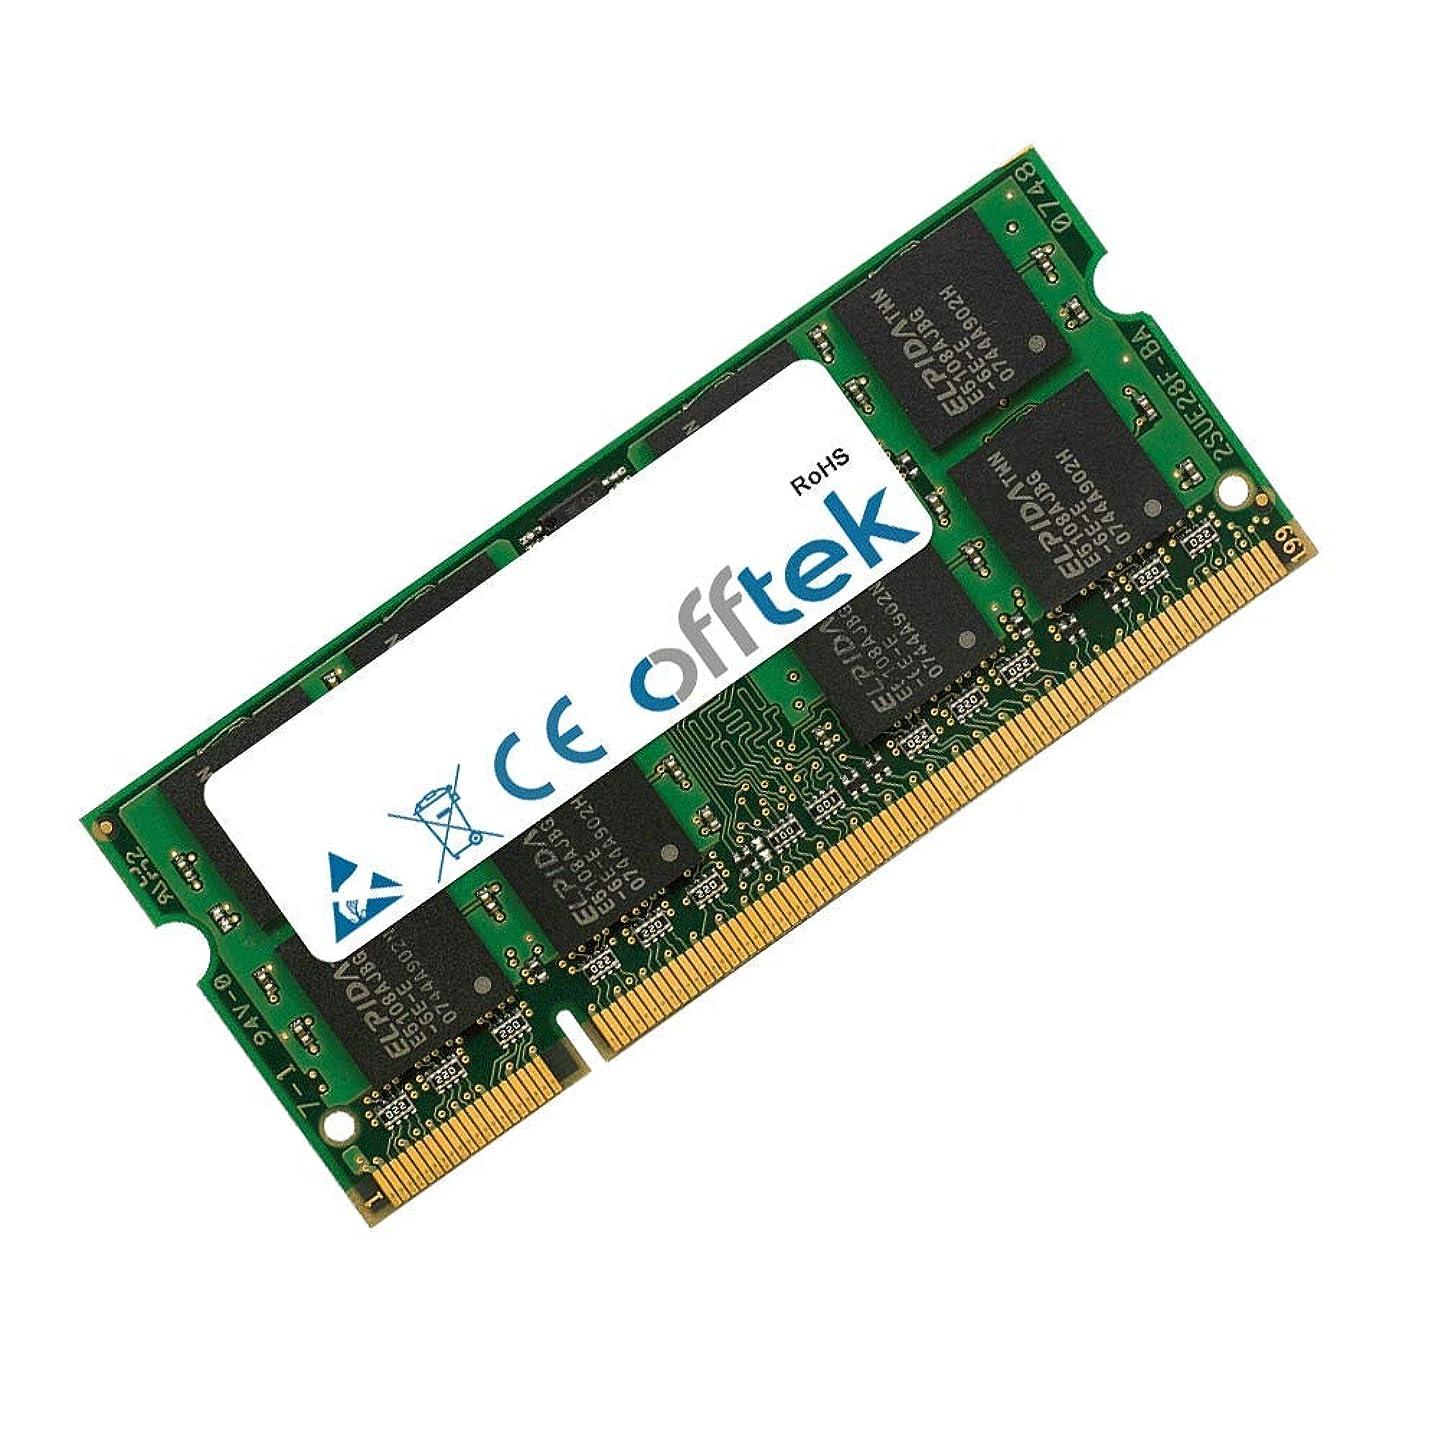 2GB RAM Memory for Gateway LT2016u (DDR2-5300) - Netbook Memory Upgrade